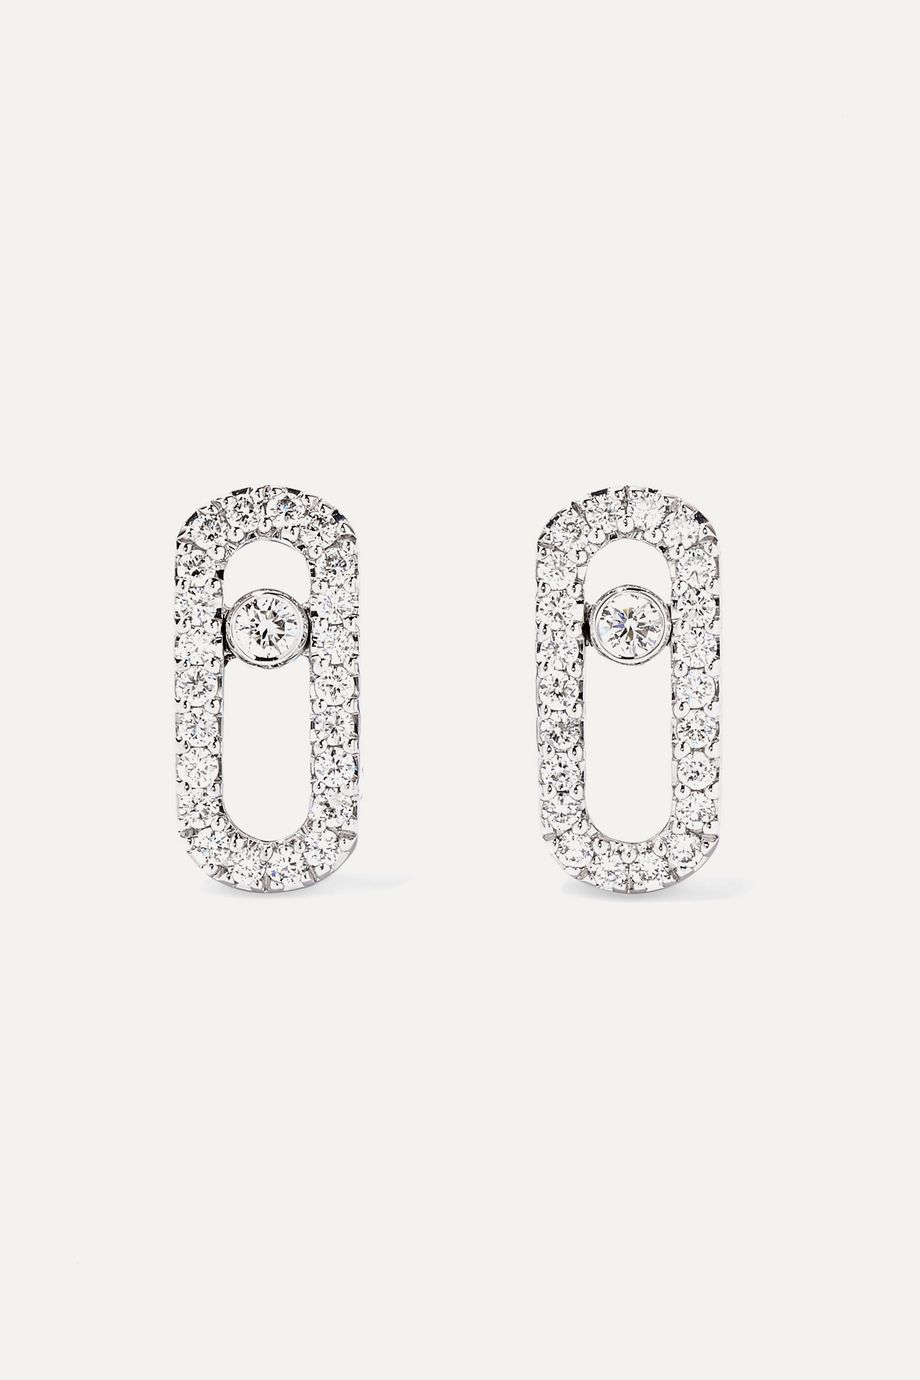 Messika Move Uno 18-karat white gold diamond earrings